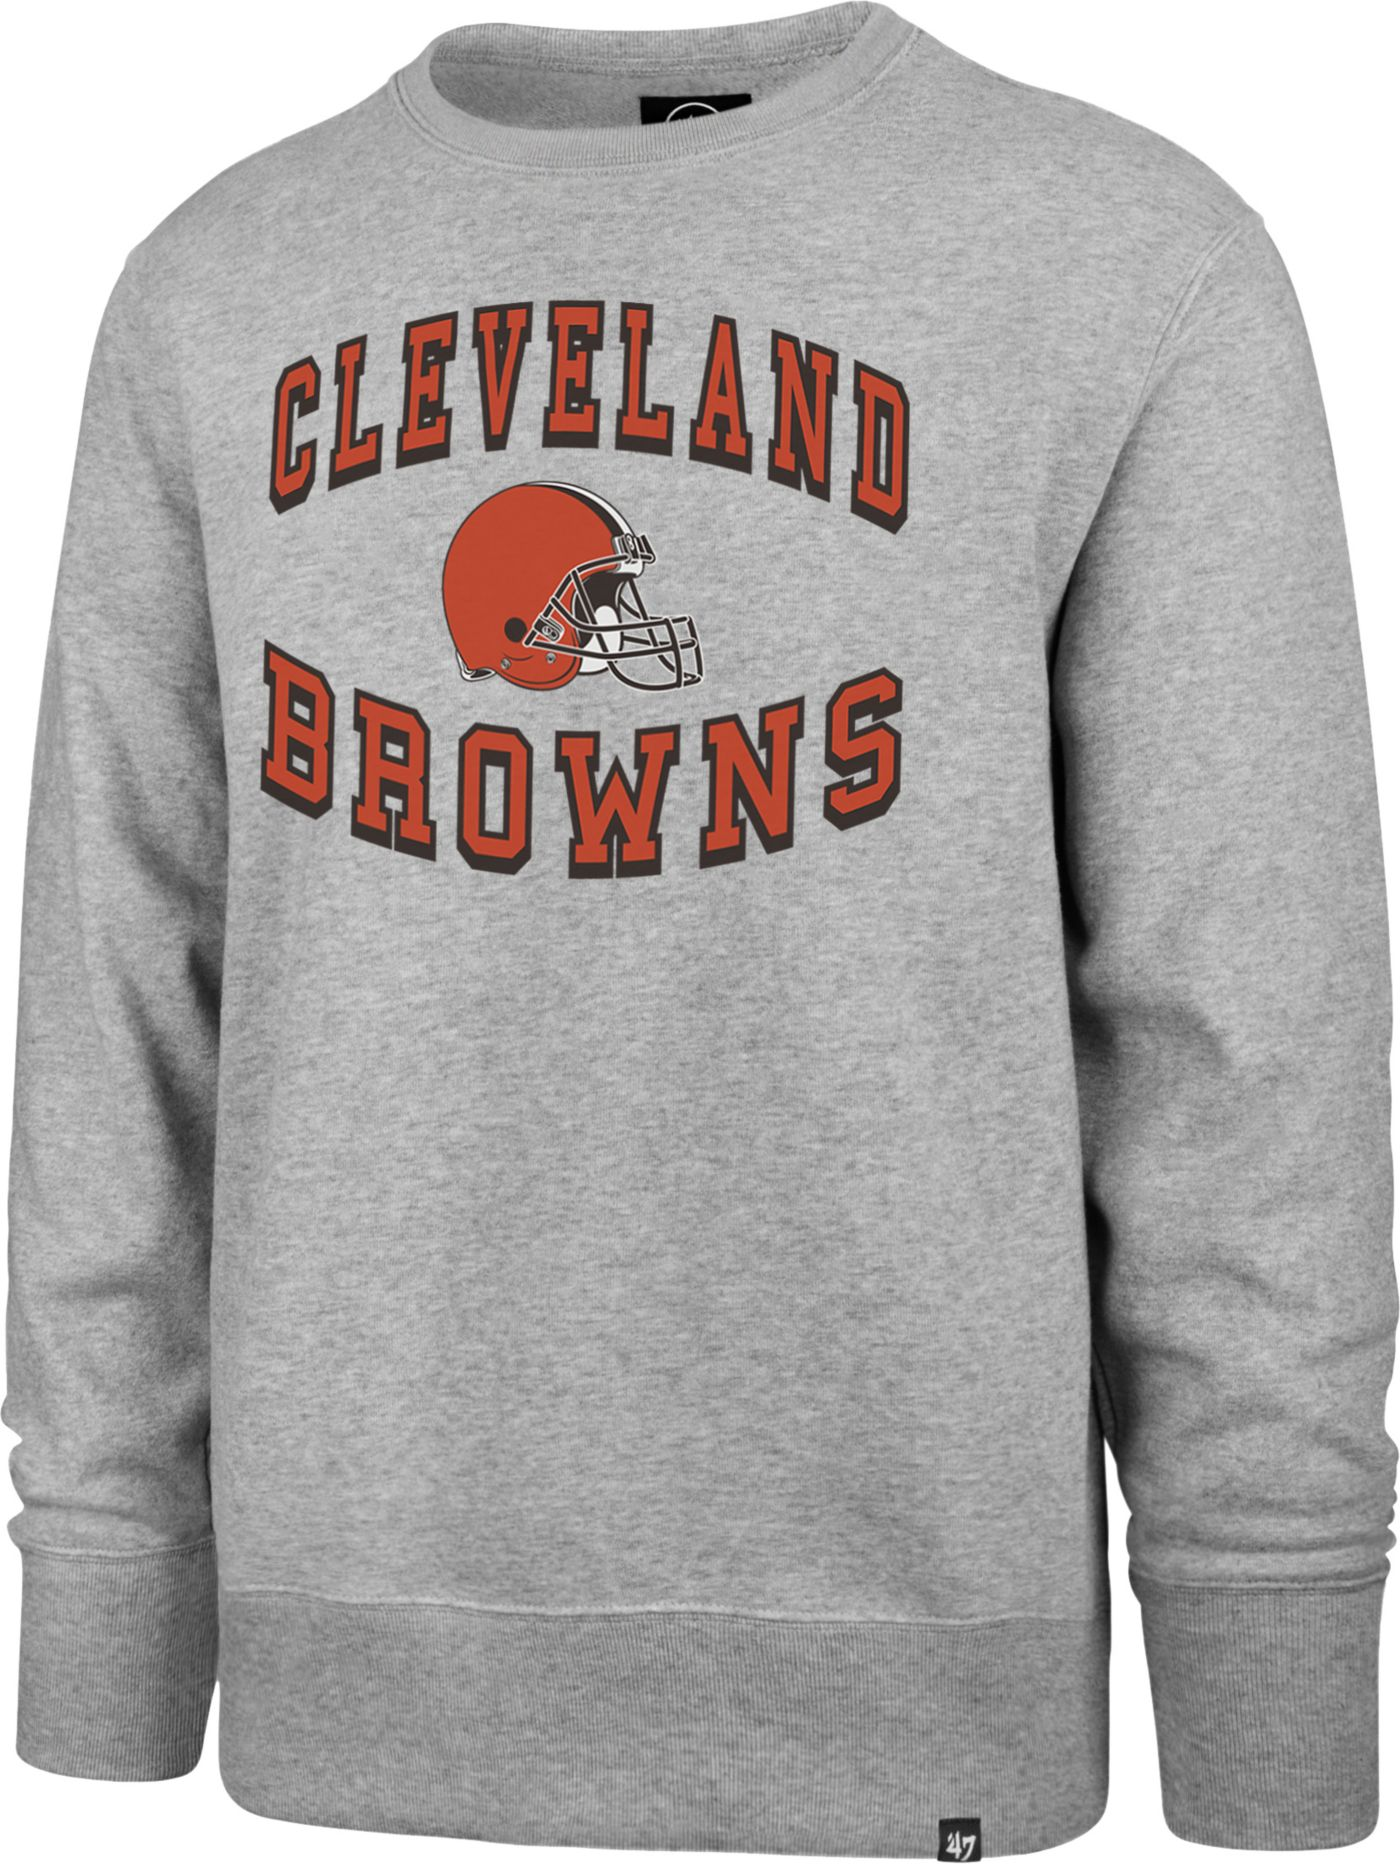 '47 Men's Cleveland Browns Headline Grey Crew